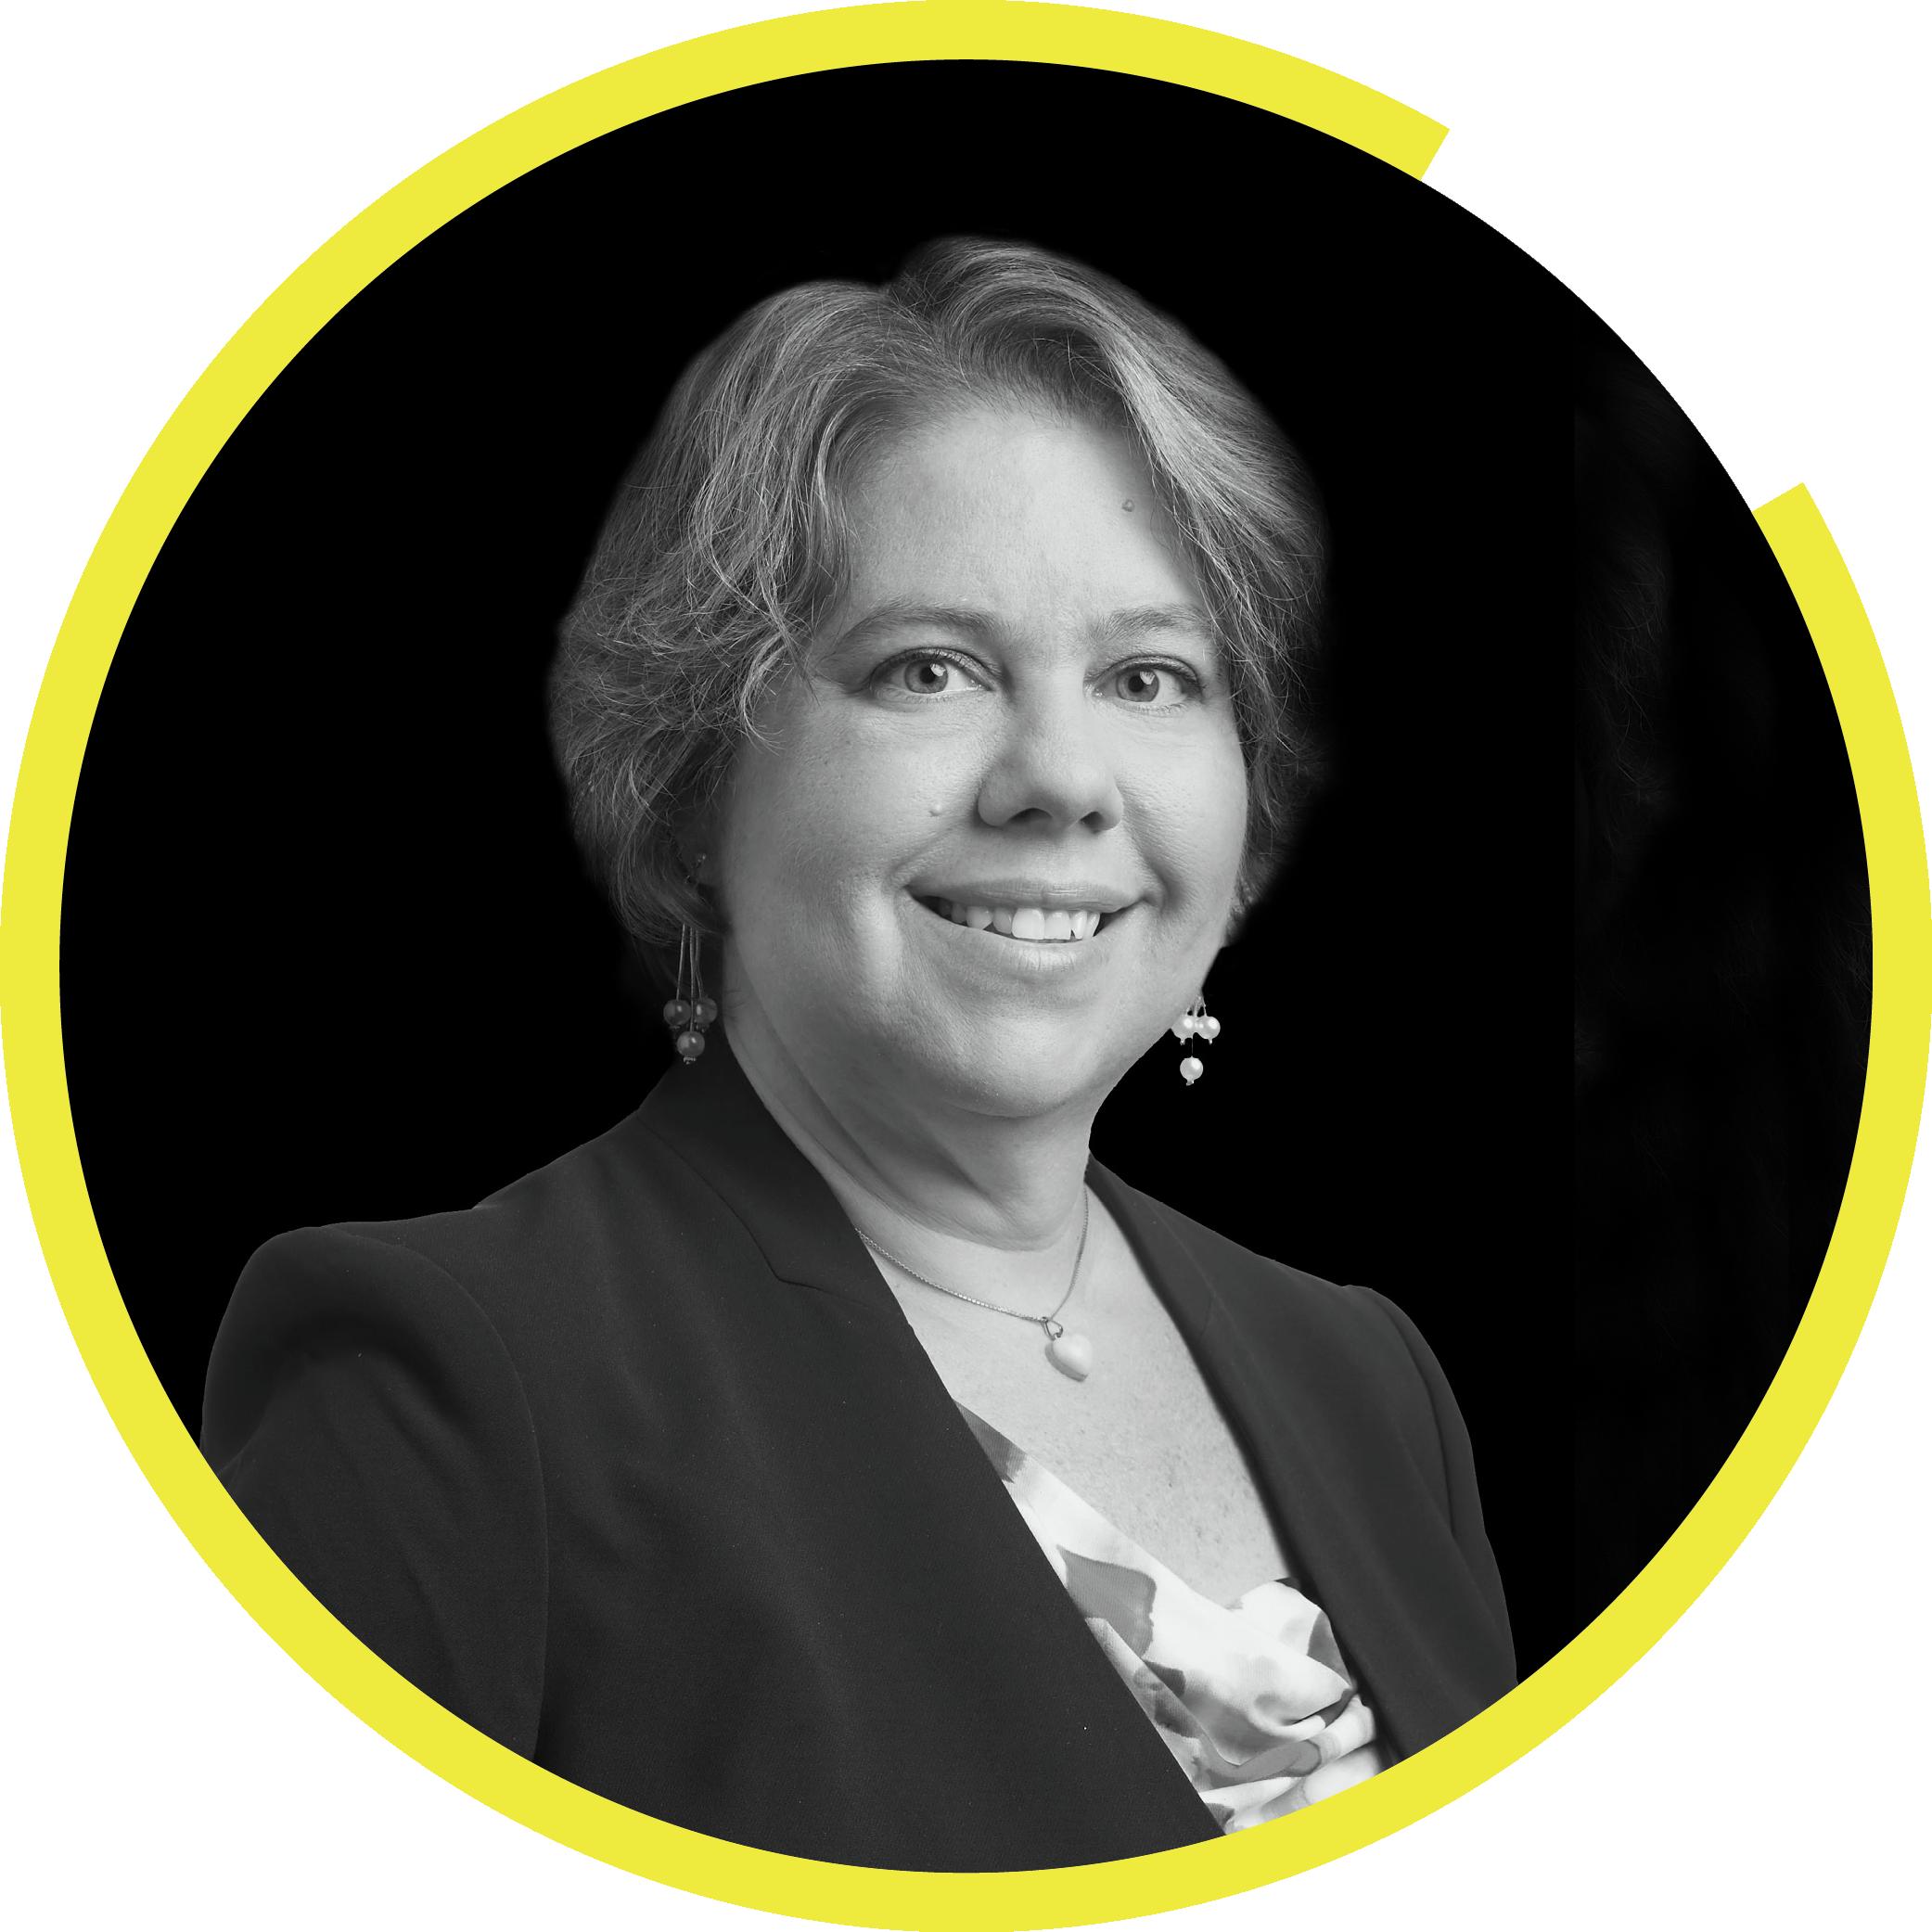 Carolina Bessega, Speaker at C2 Montréal 2019